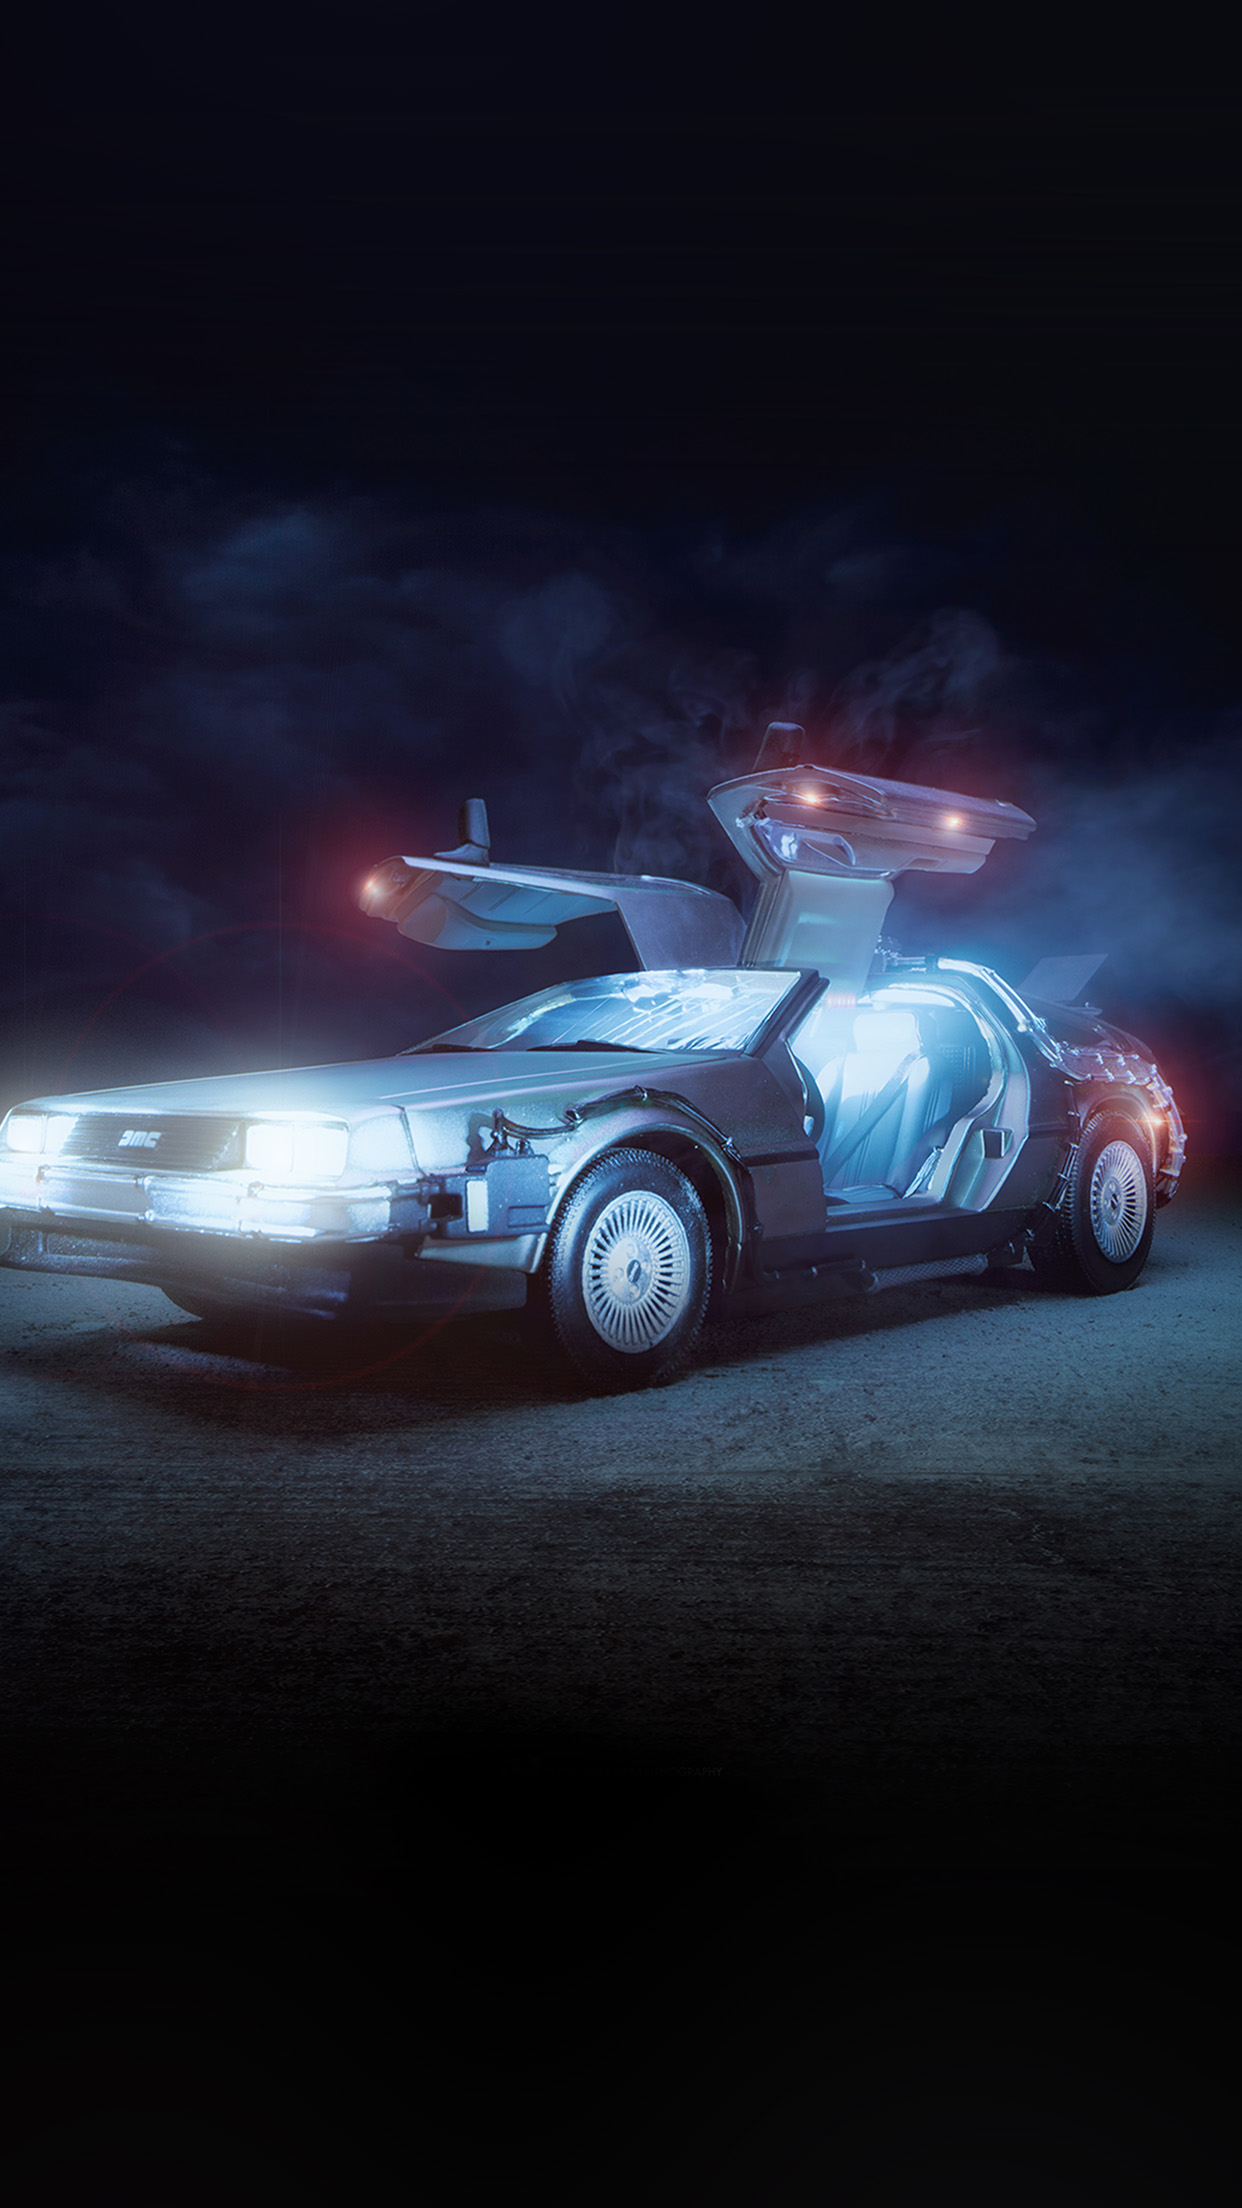 Bj67 Art Back Tothe Future Car Film Wallpaper